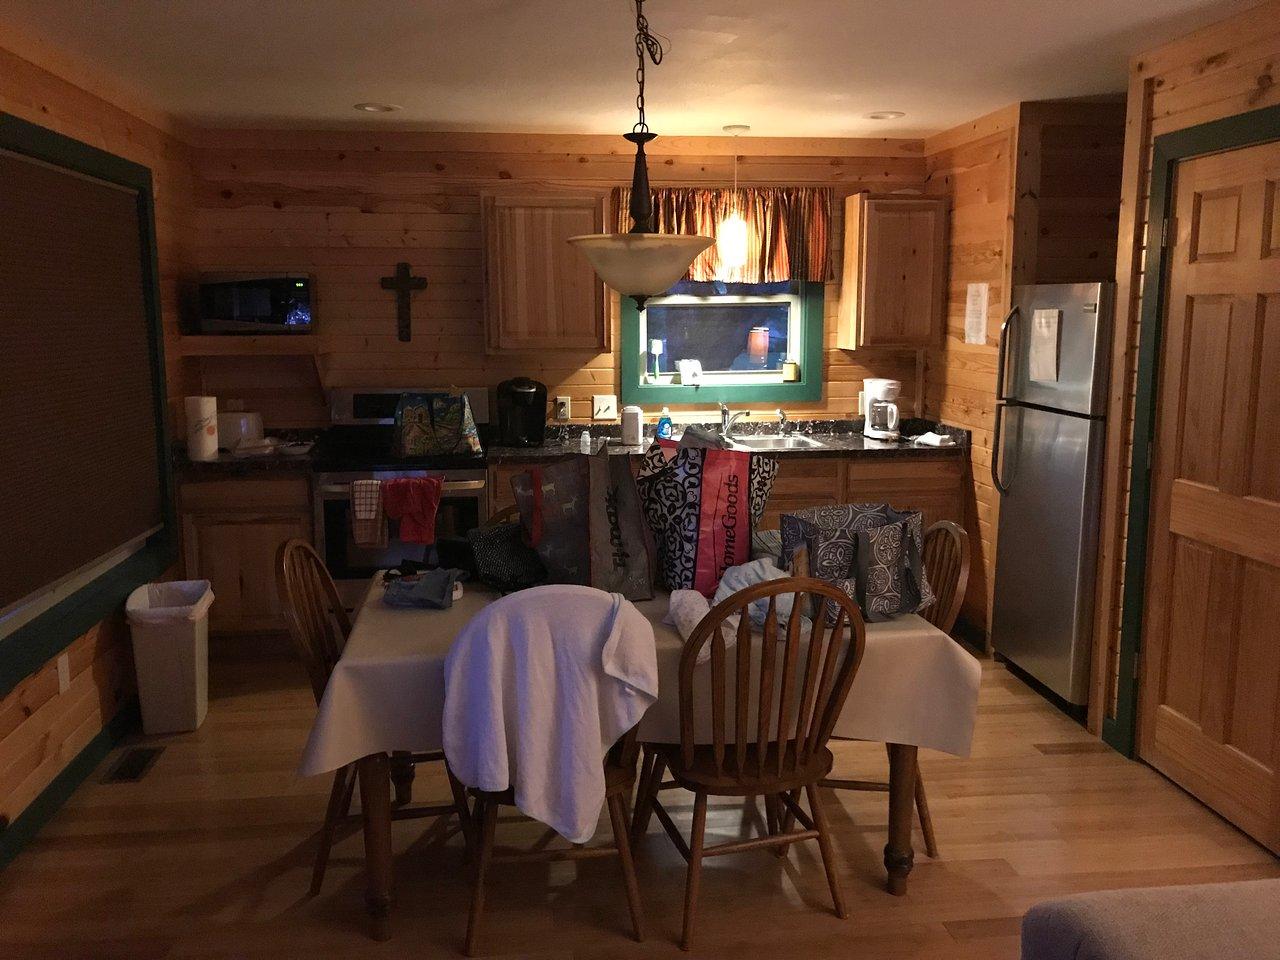 edgewater beach resort updated 2018 hotel reviews forsyth mo rh tripadvisor co nz